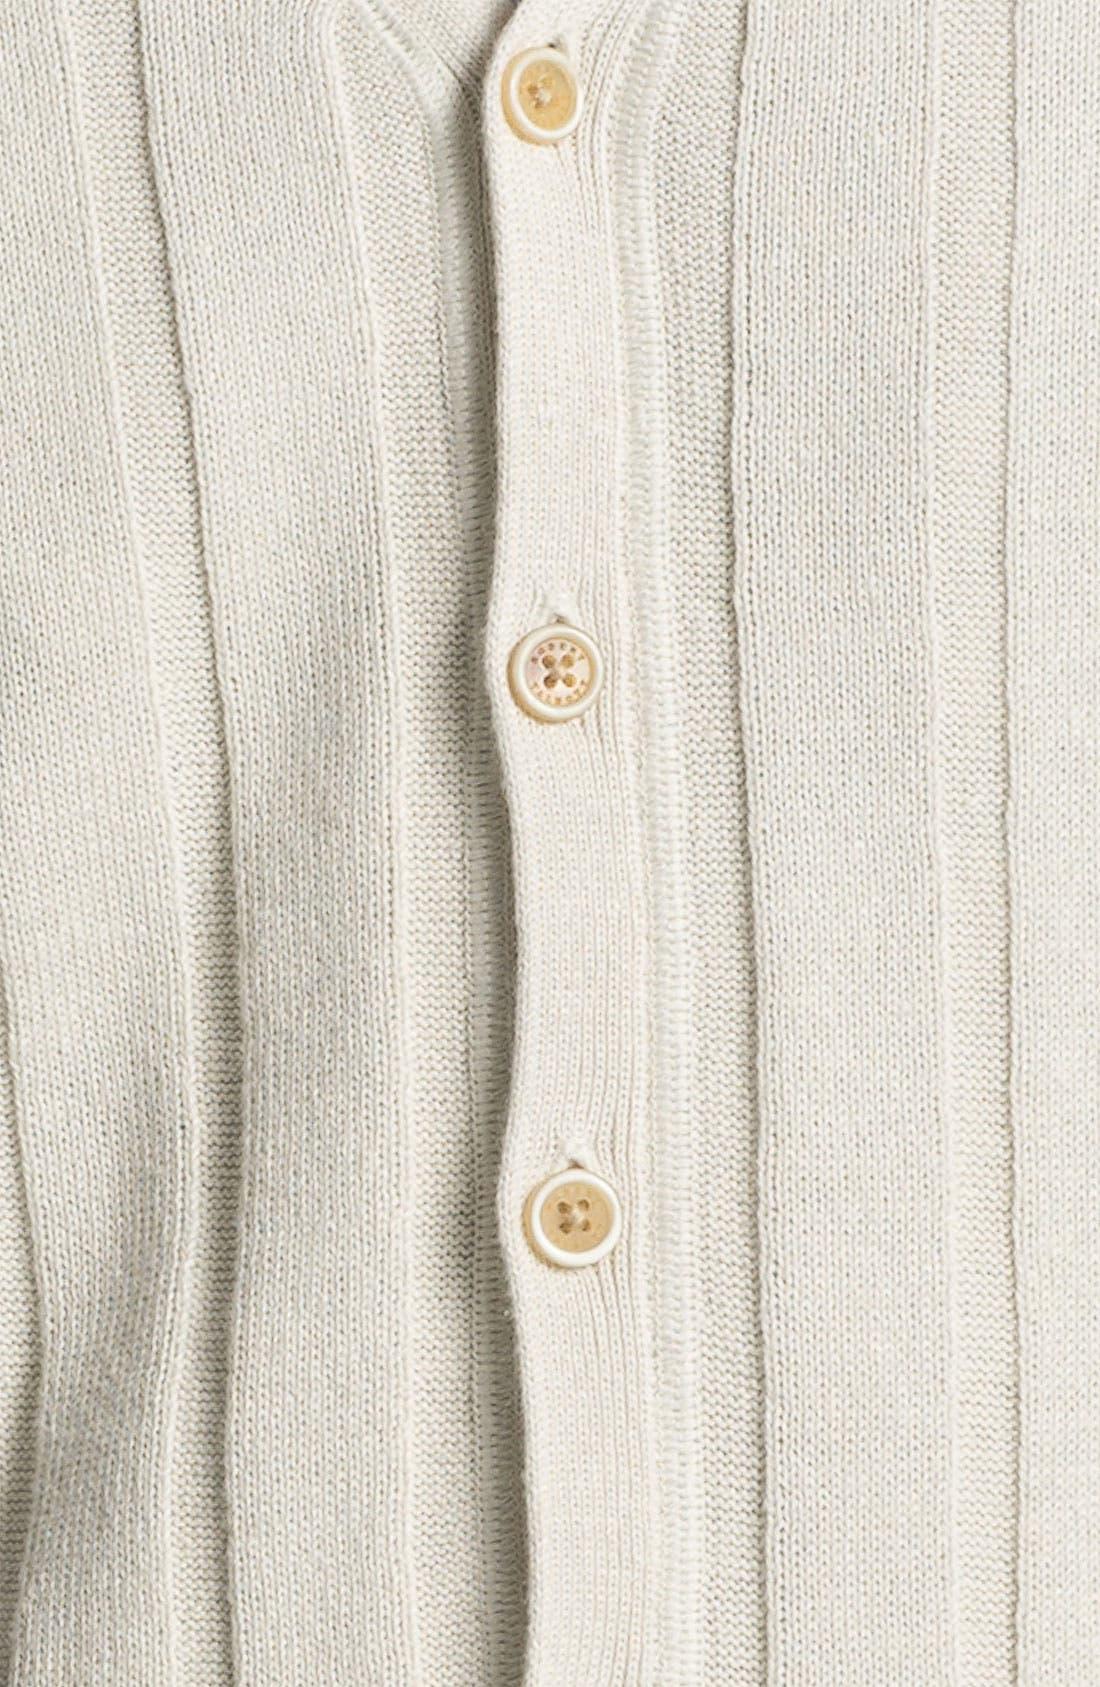 Alternate Image 3  - Robert Talbott Linen & Cotton Sweater Vest